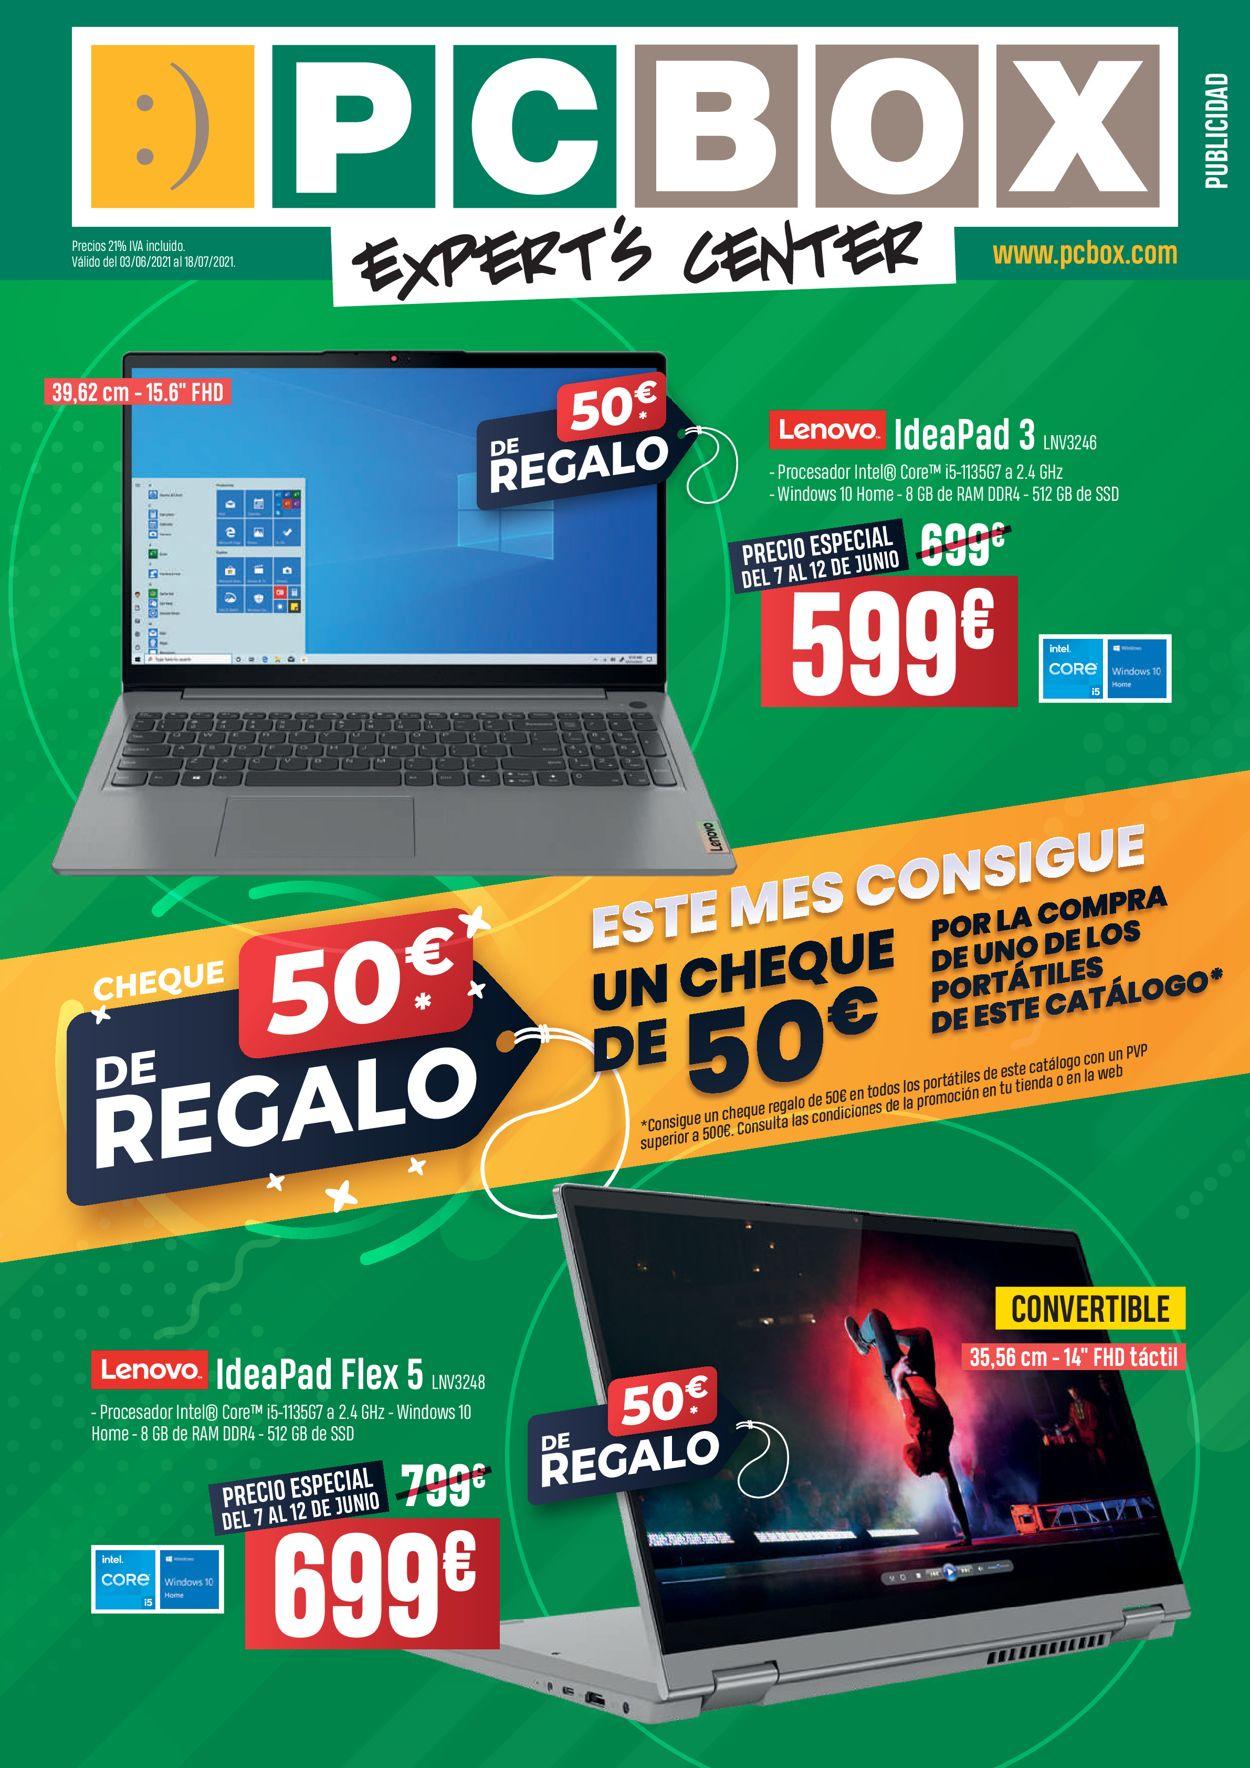 PC Box Folleto - 03.06-18.07.2021